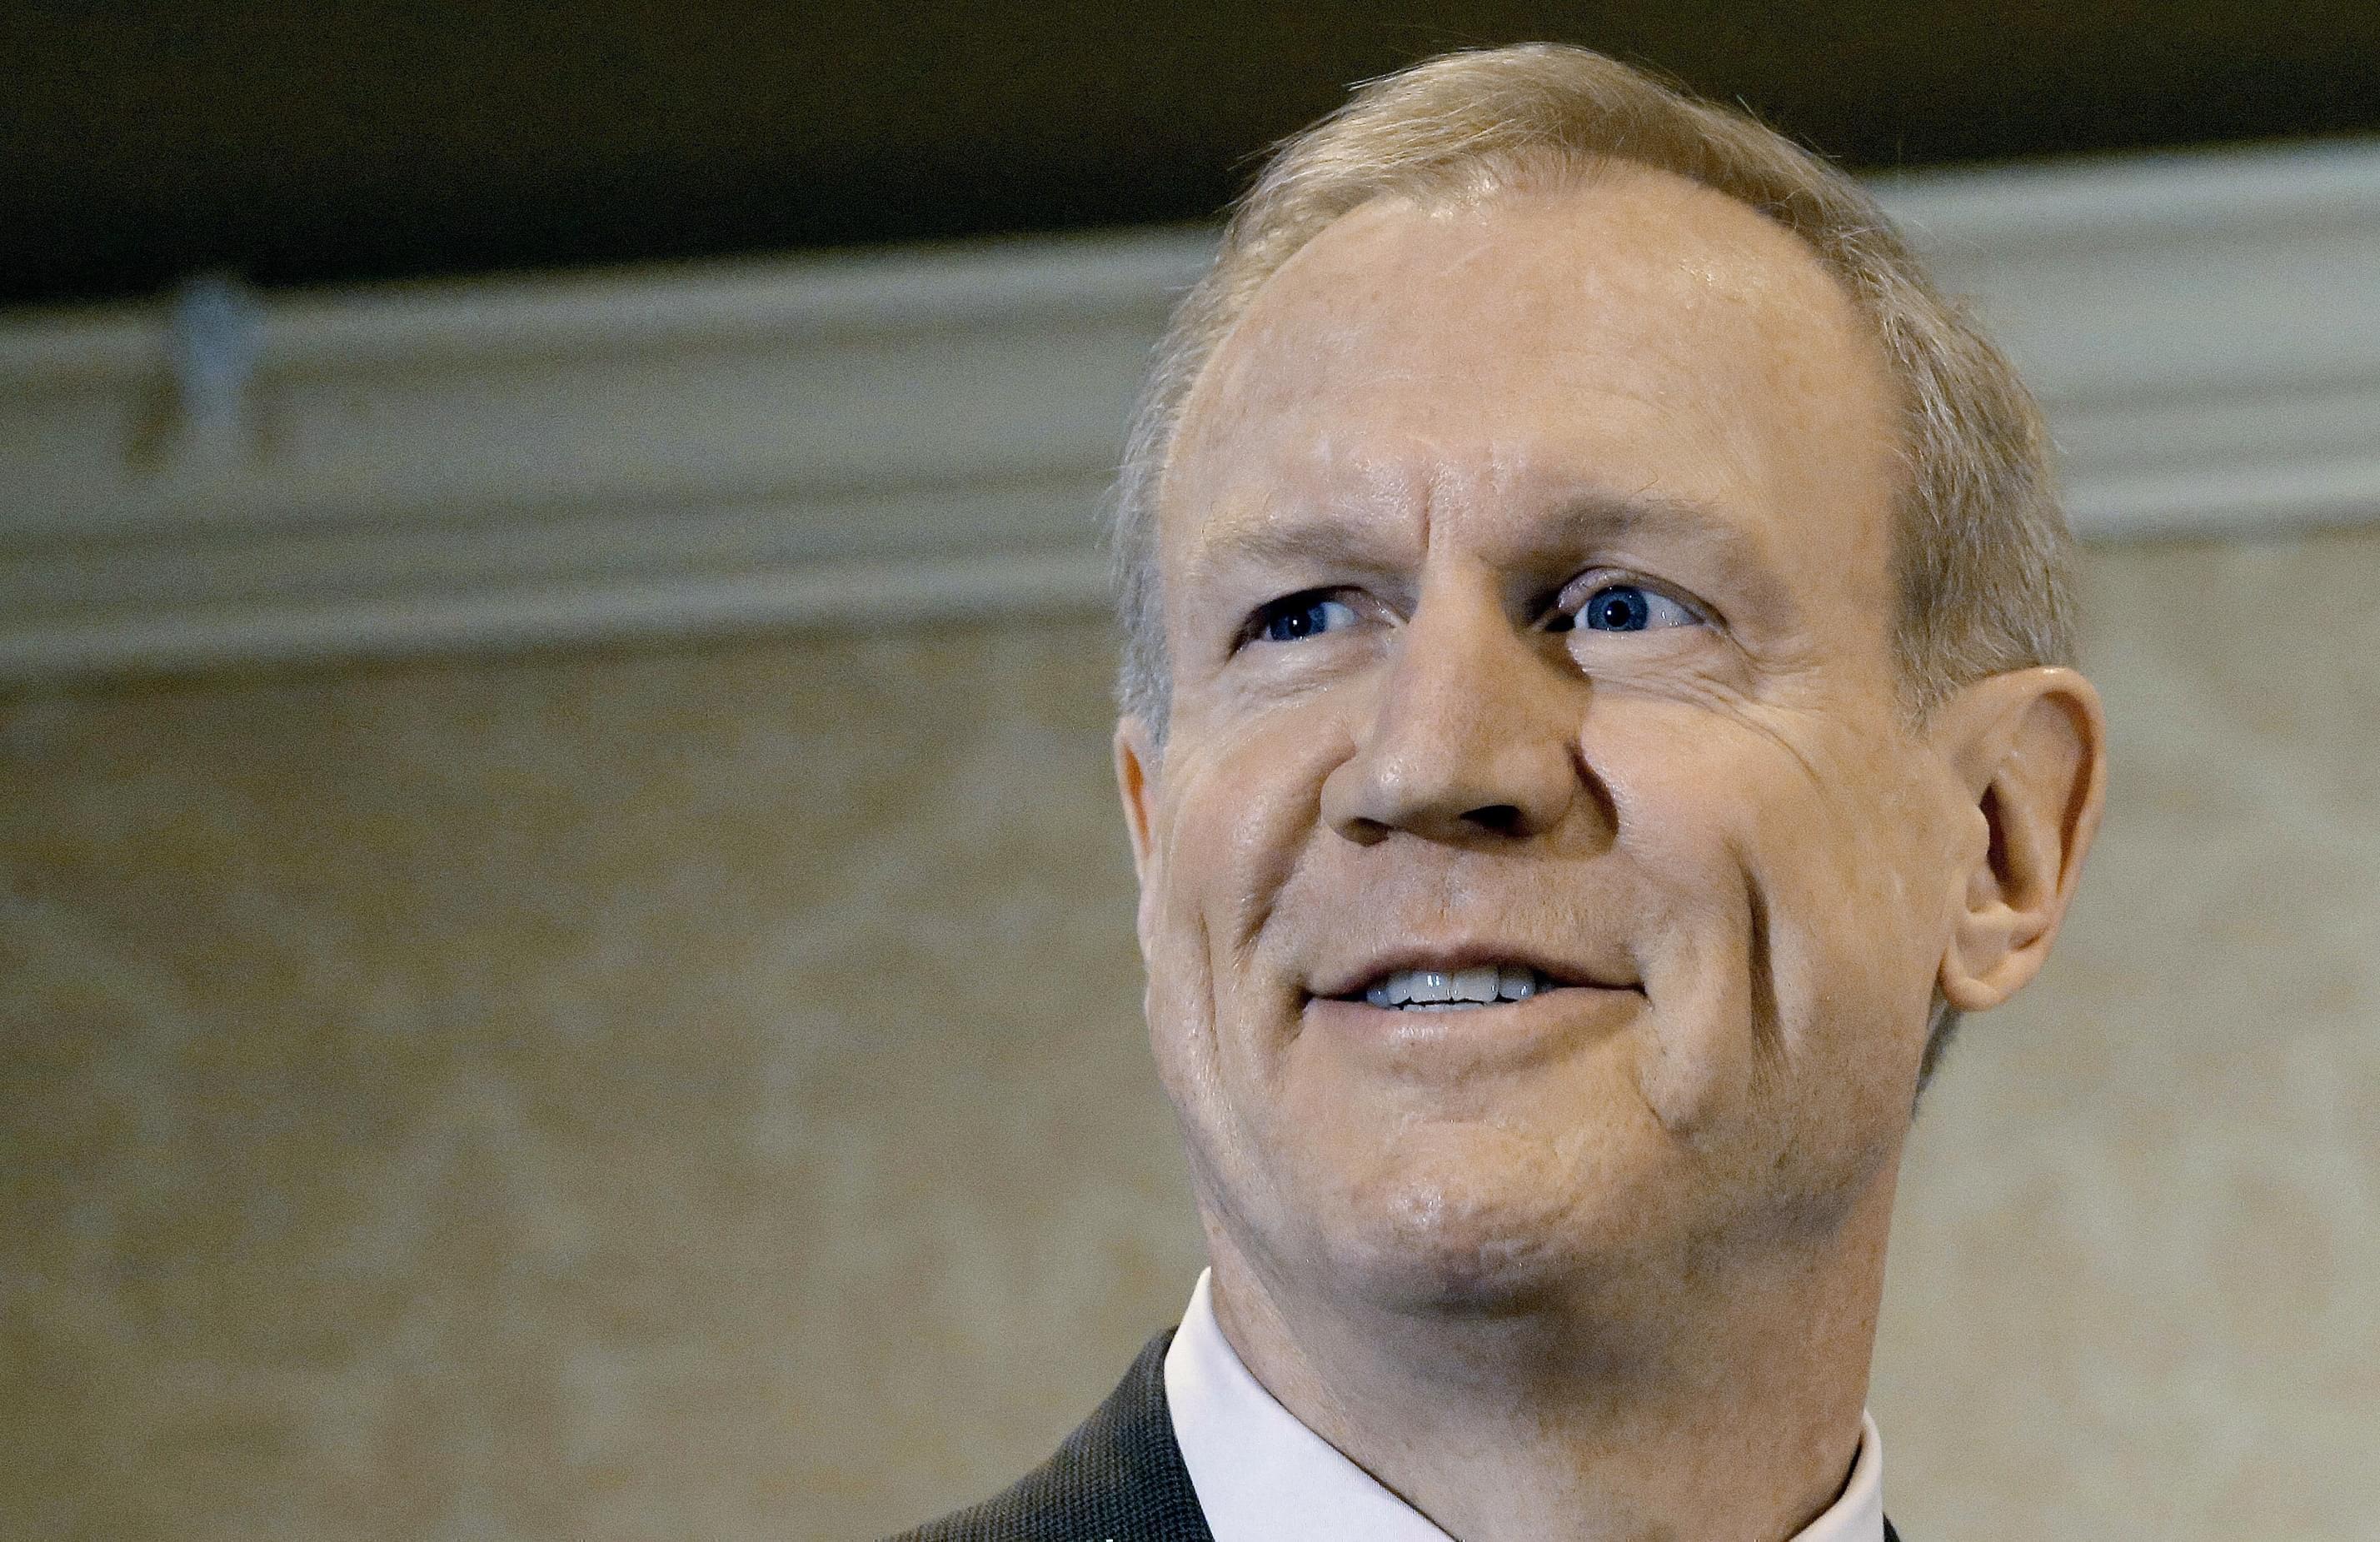 Illinois Governor-elect Bruce Rauner.